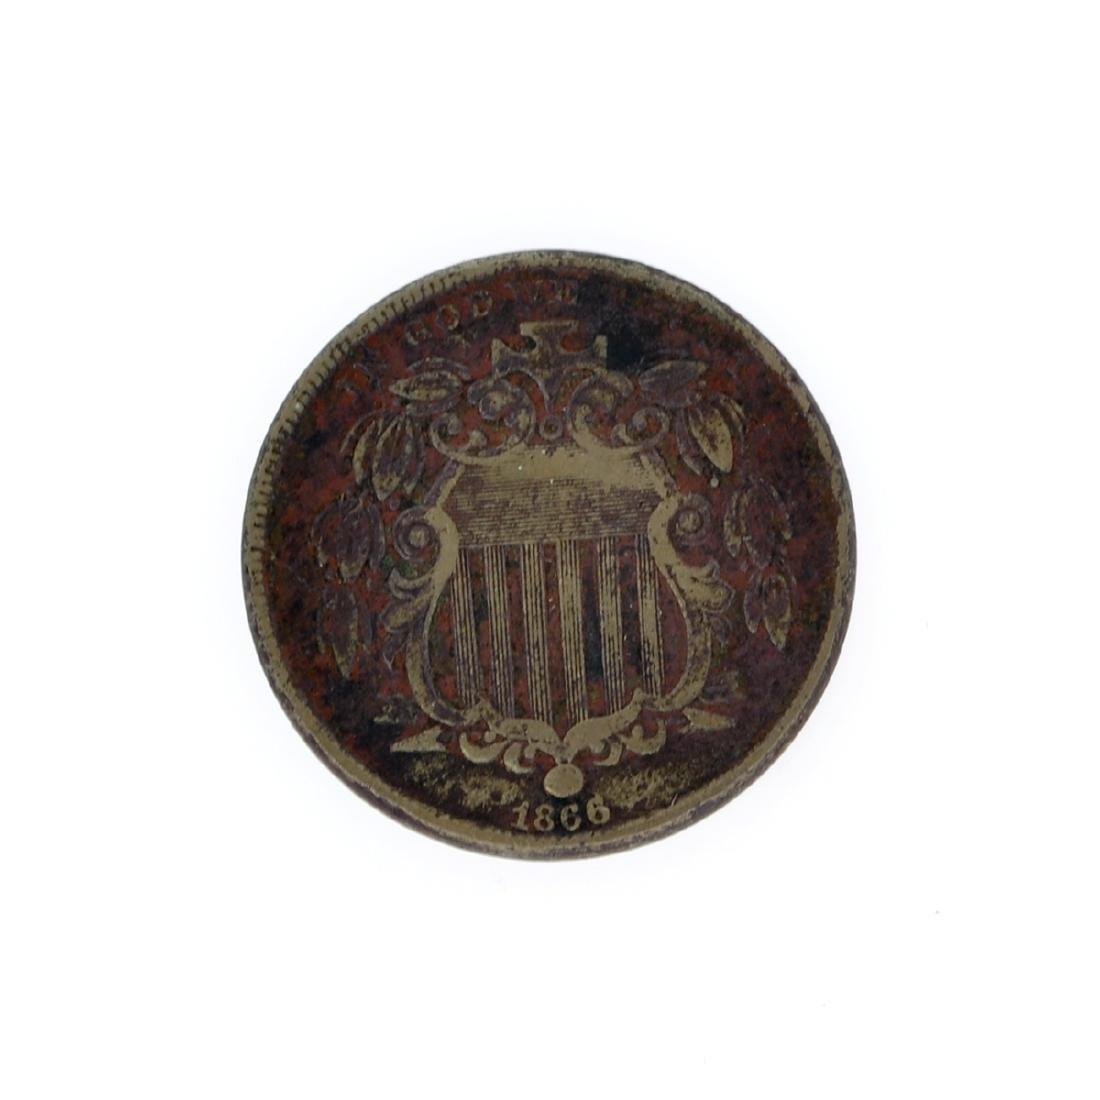 Rare 1866 Shield Nickel Coin